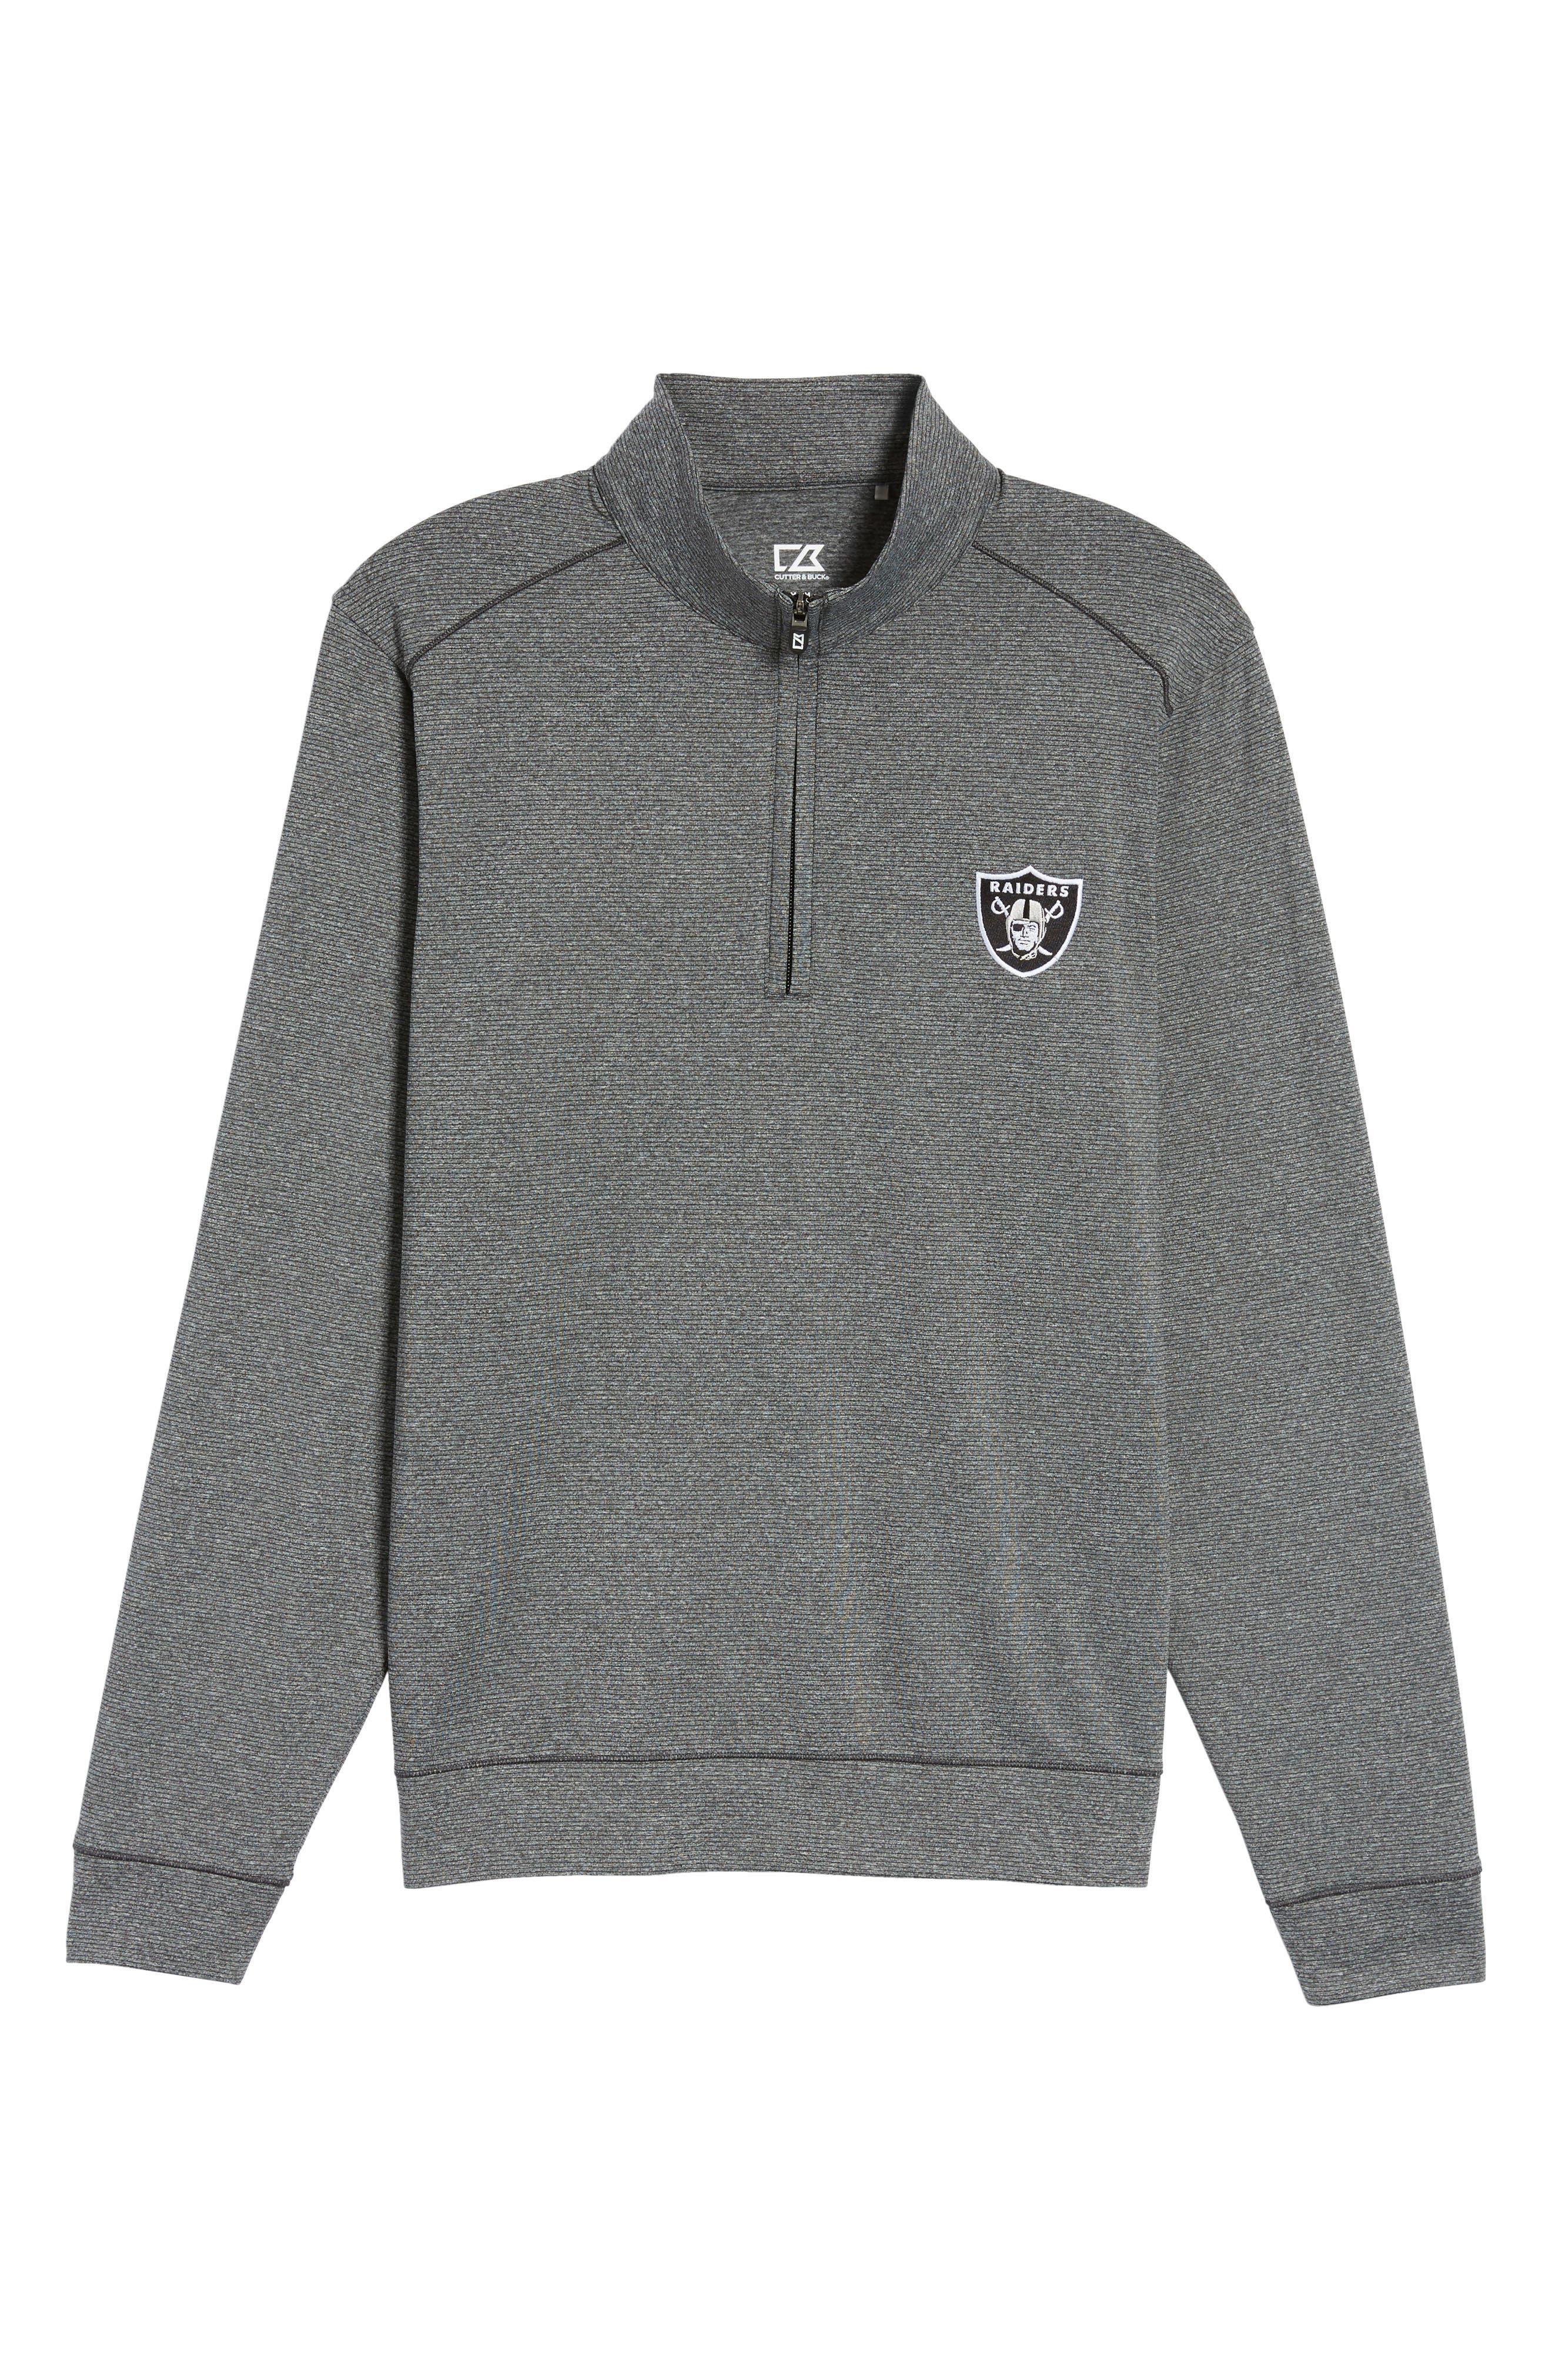 Shoreline - Oakland Raiders Half Zip Pullover,                             Alternate thumbnail 6, color,                             Charcoal Heather